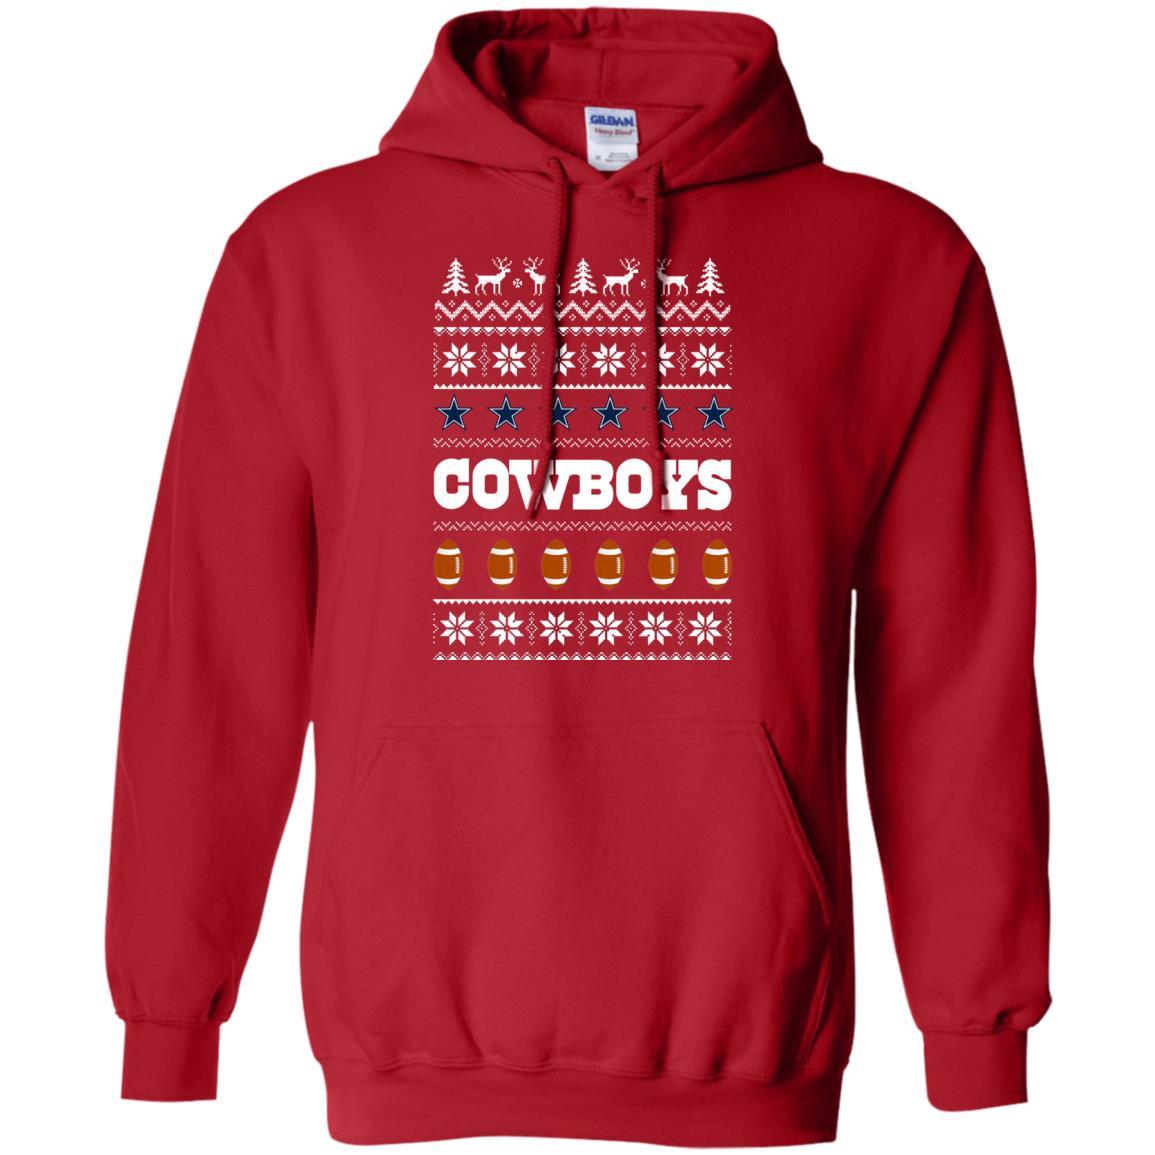 sale retailer 26b60 3bcdd CowBoys Christmas Ugly Sweater, Shirt, Hoodie